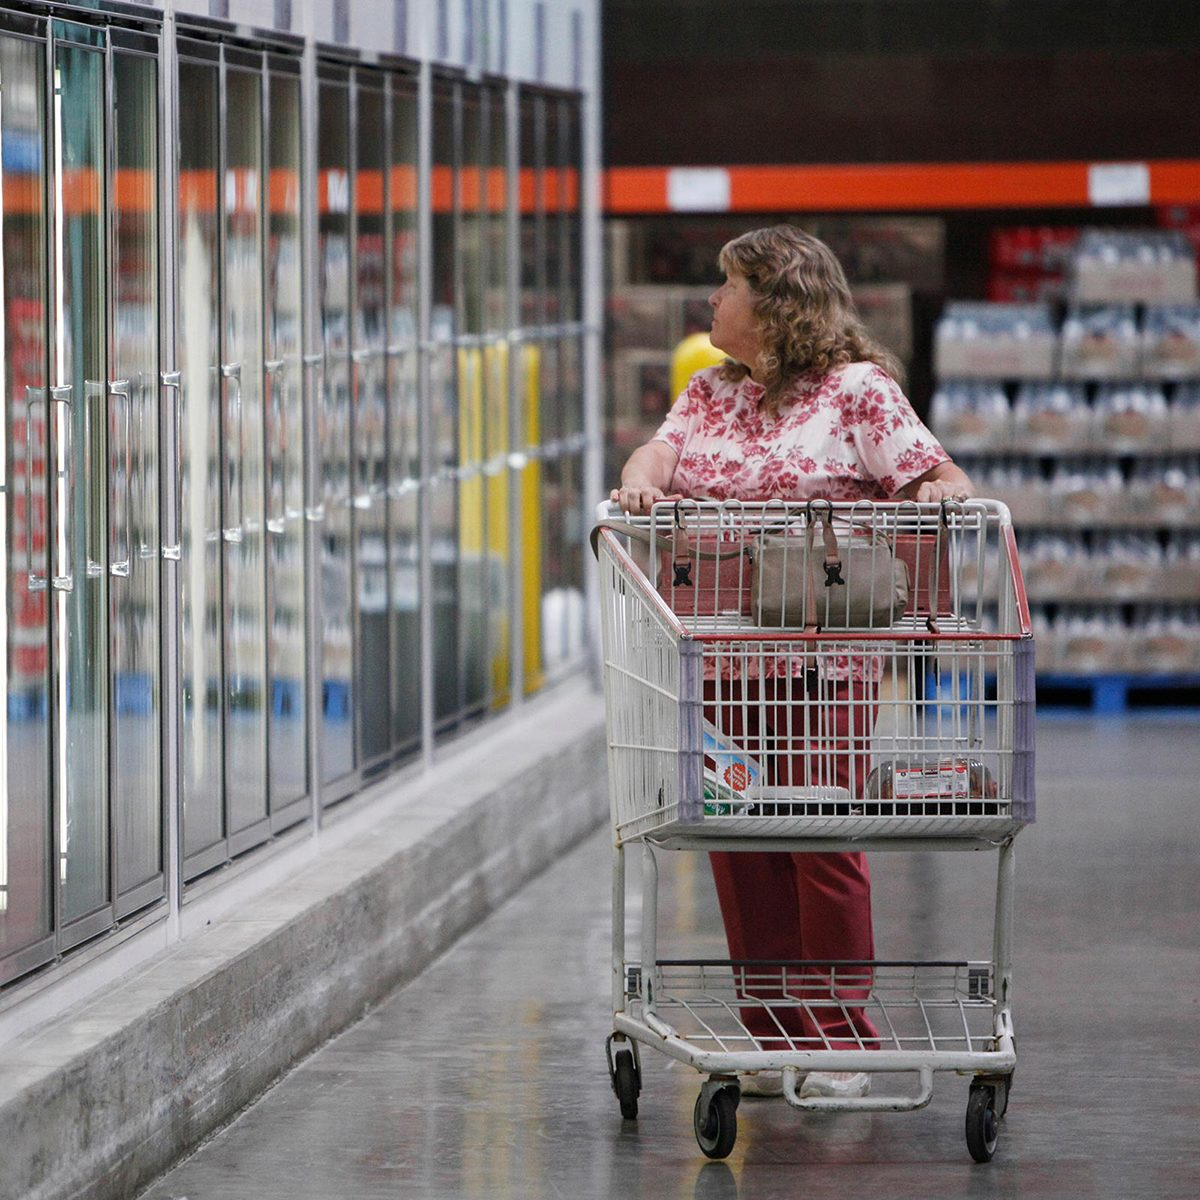 Shopper in Costco freezer section